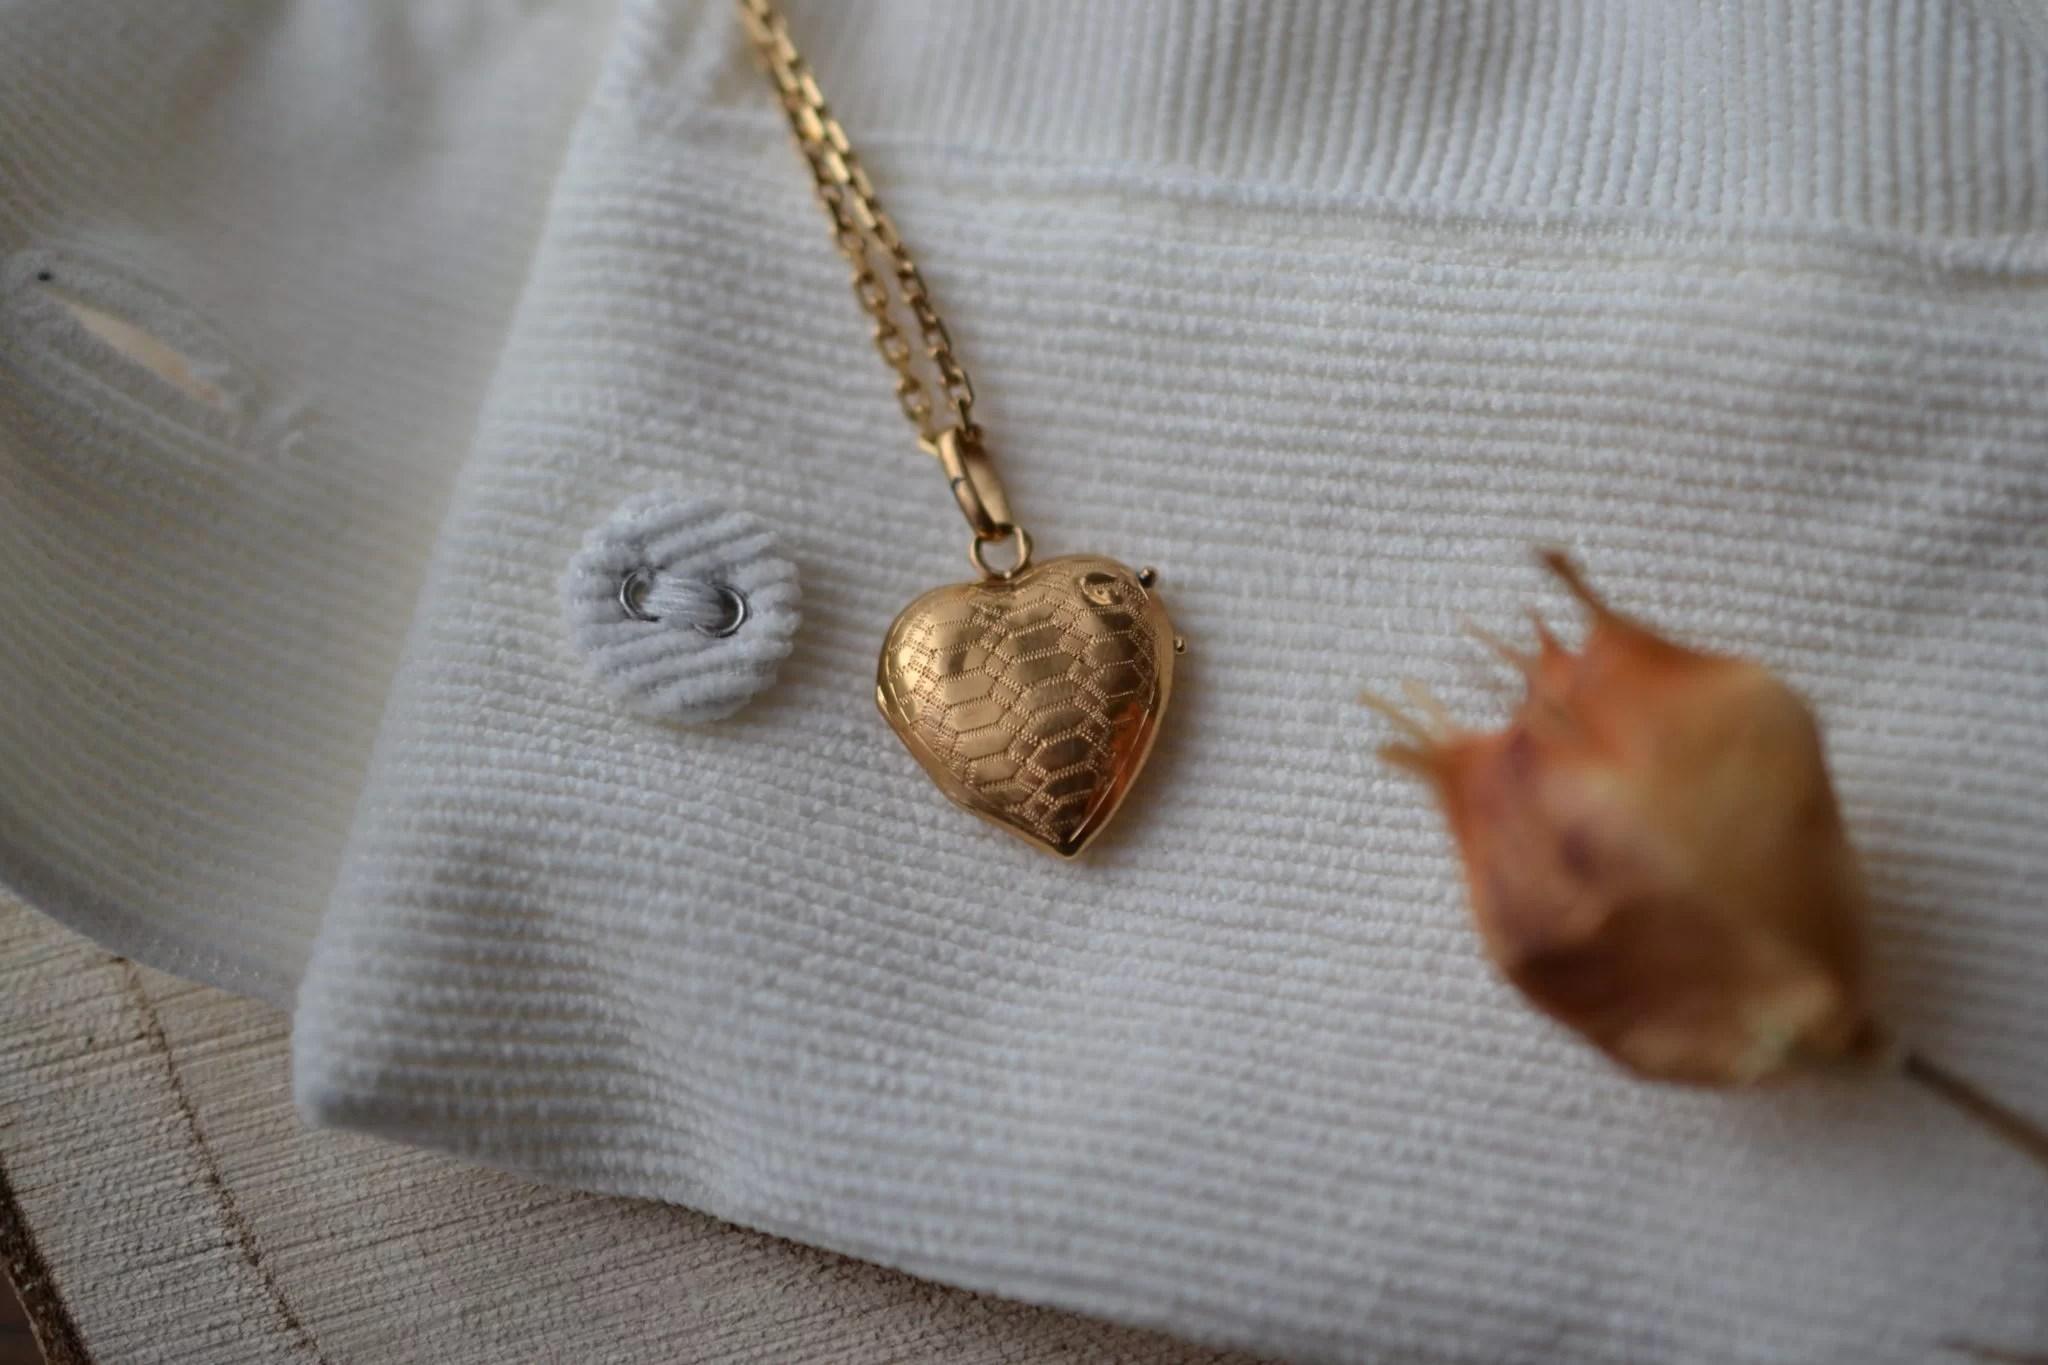 Pendentif ouvrant en forme de cœur en Or jaune - pendentif de seconde main